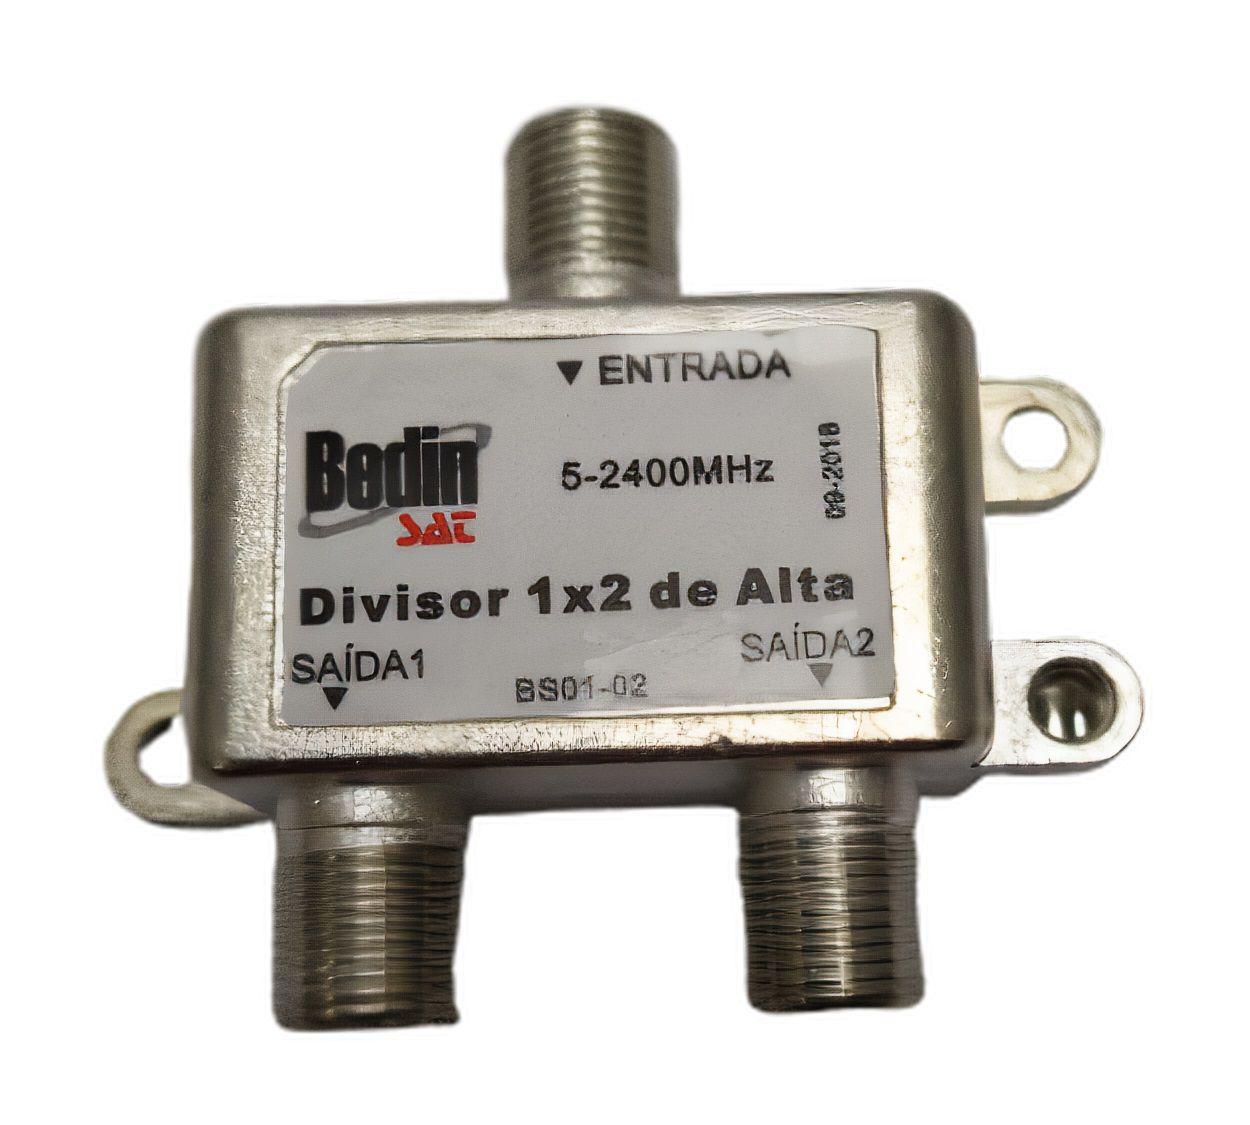 Divisor 1:2 Alta , Kit Com 5 , Frequência 5-2400mhz Banda C